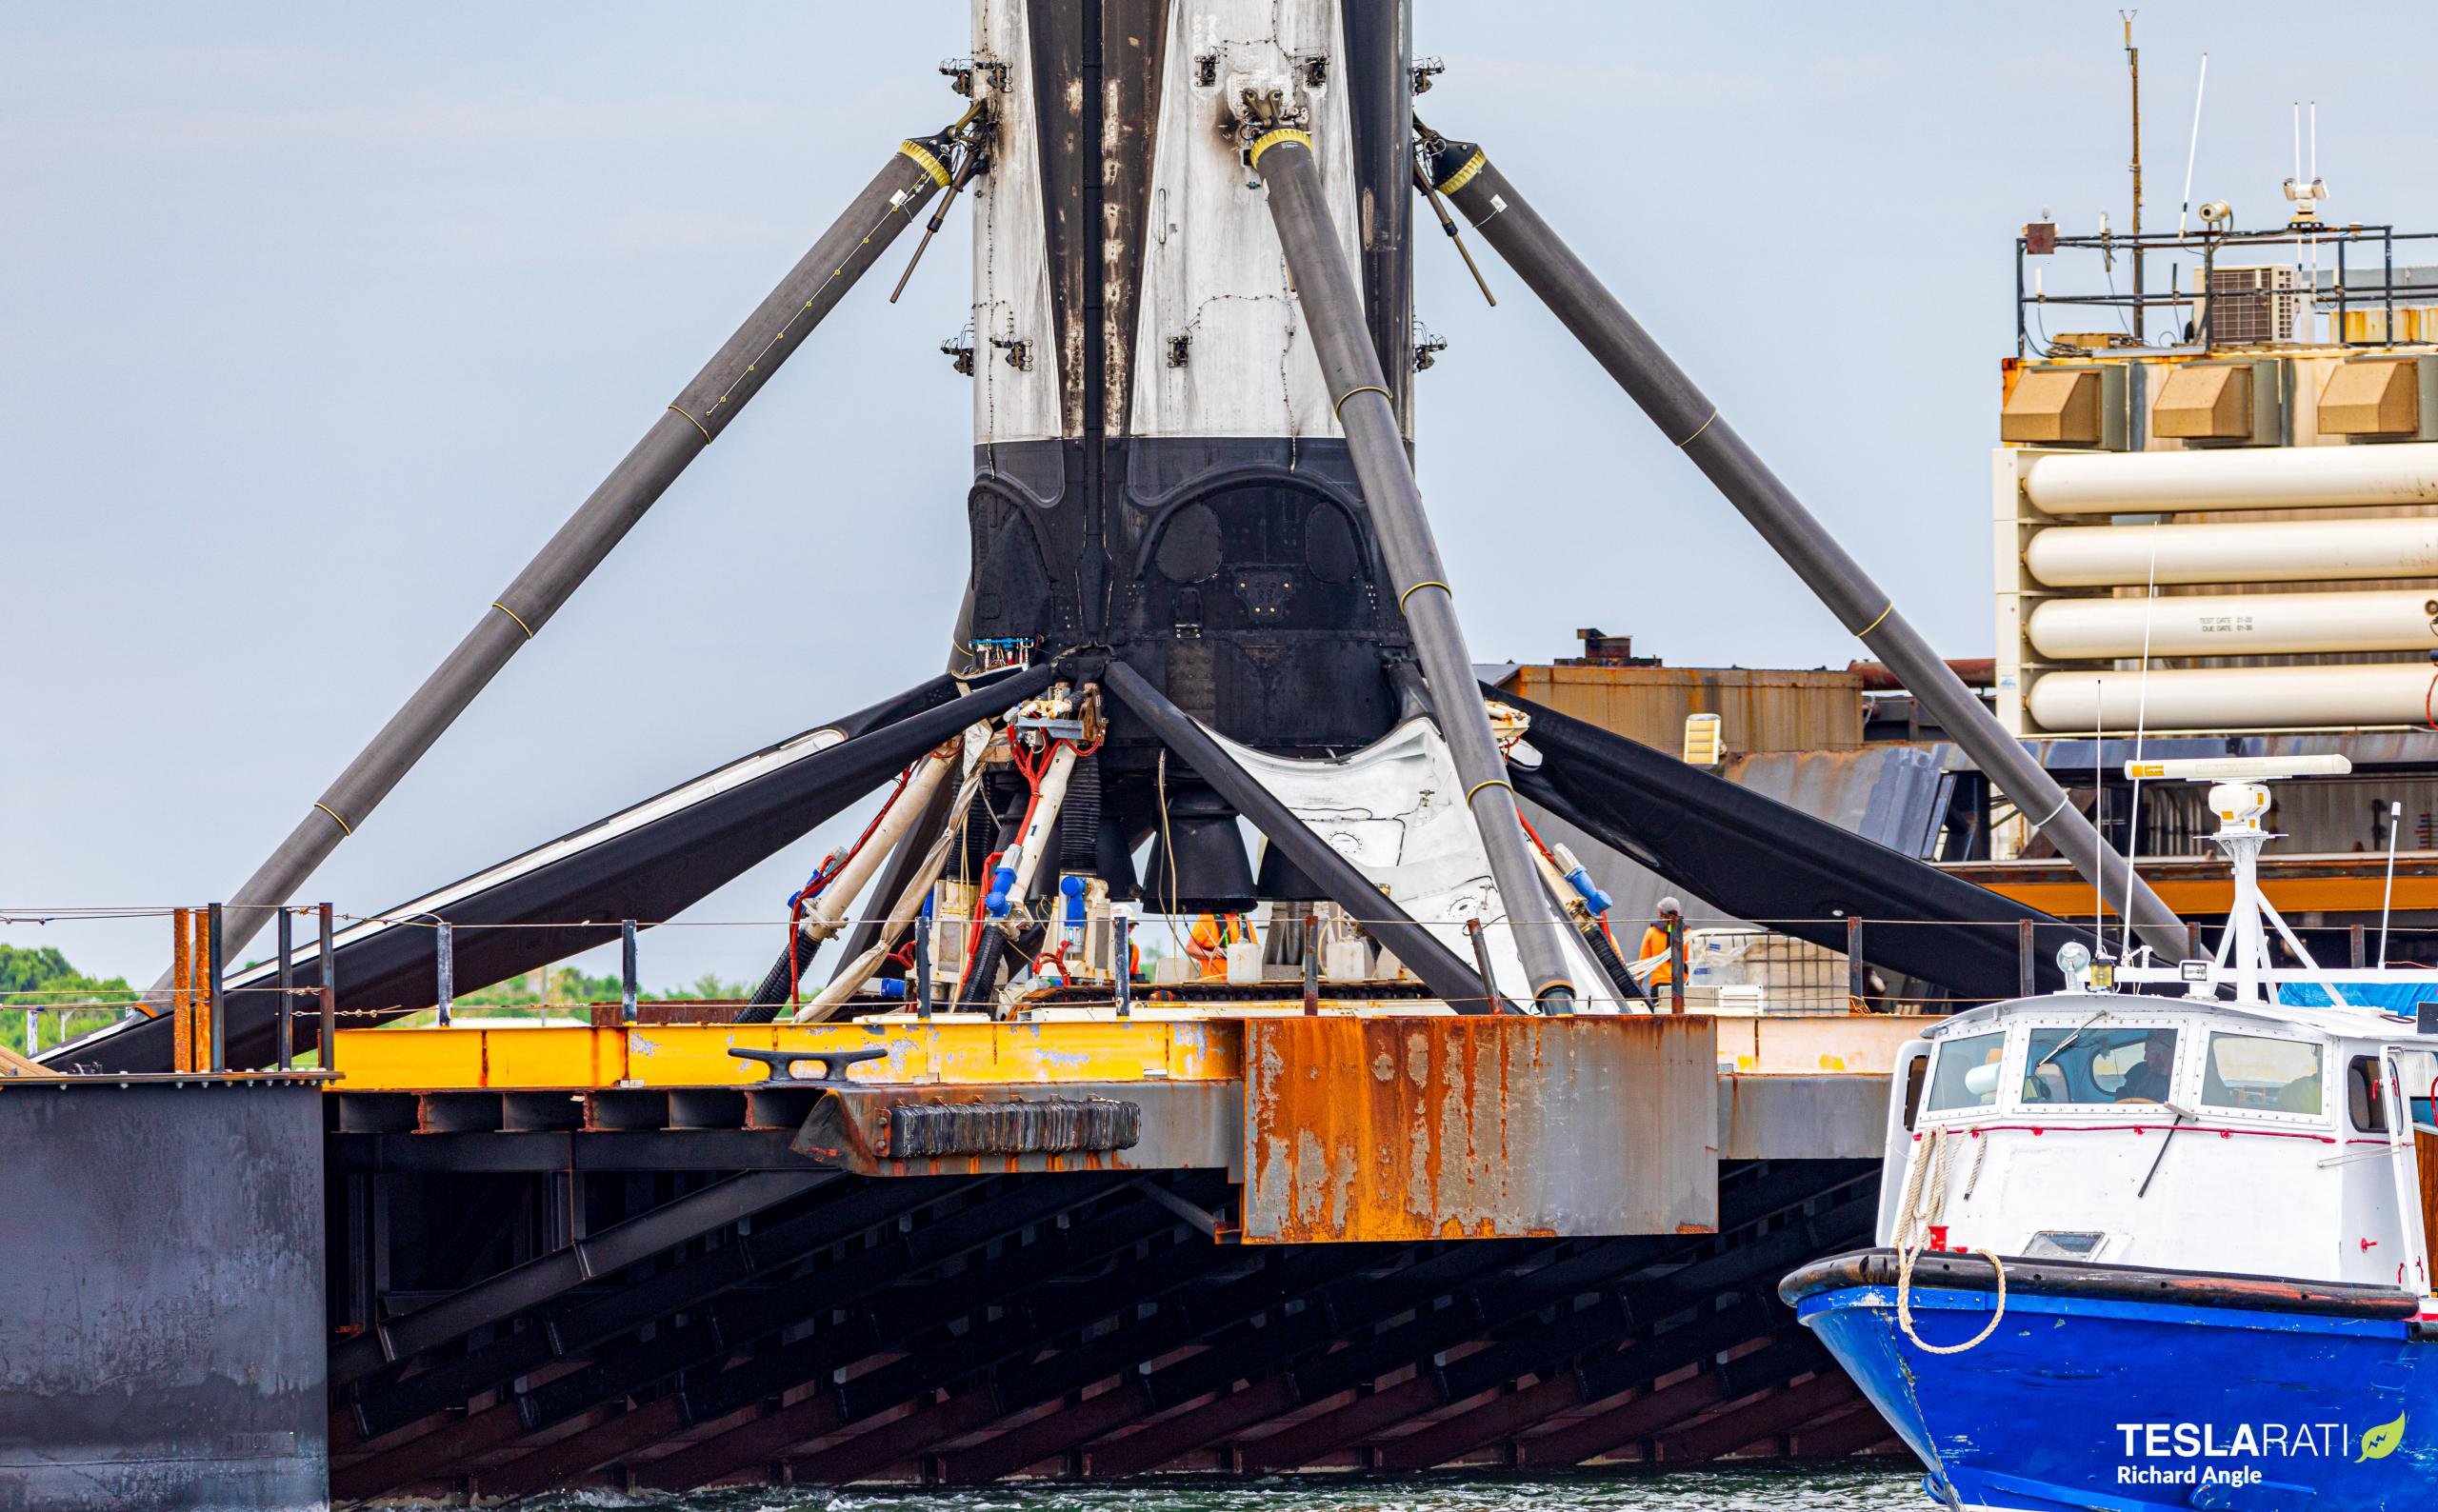 Starlink-27 Falcon 9 B1051 051221 (Richard Angle) port return 1 (c)